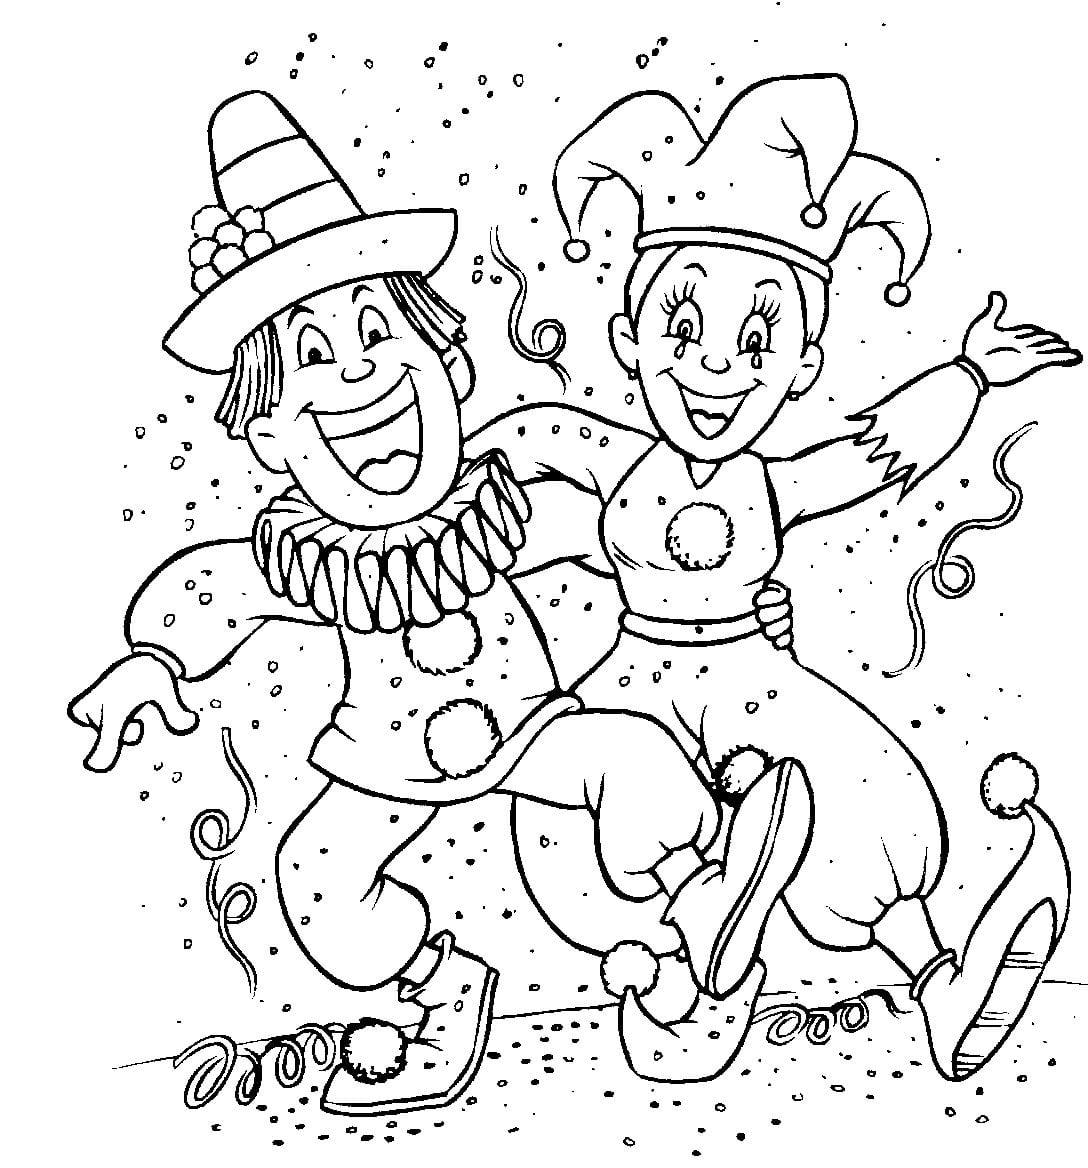 Desenho De Roupas De Carnaval Para Colorir